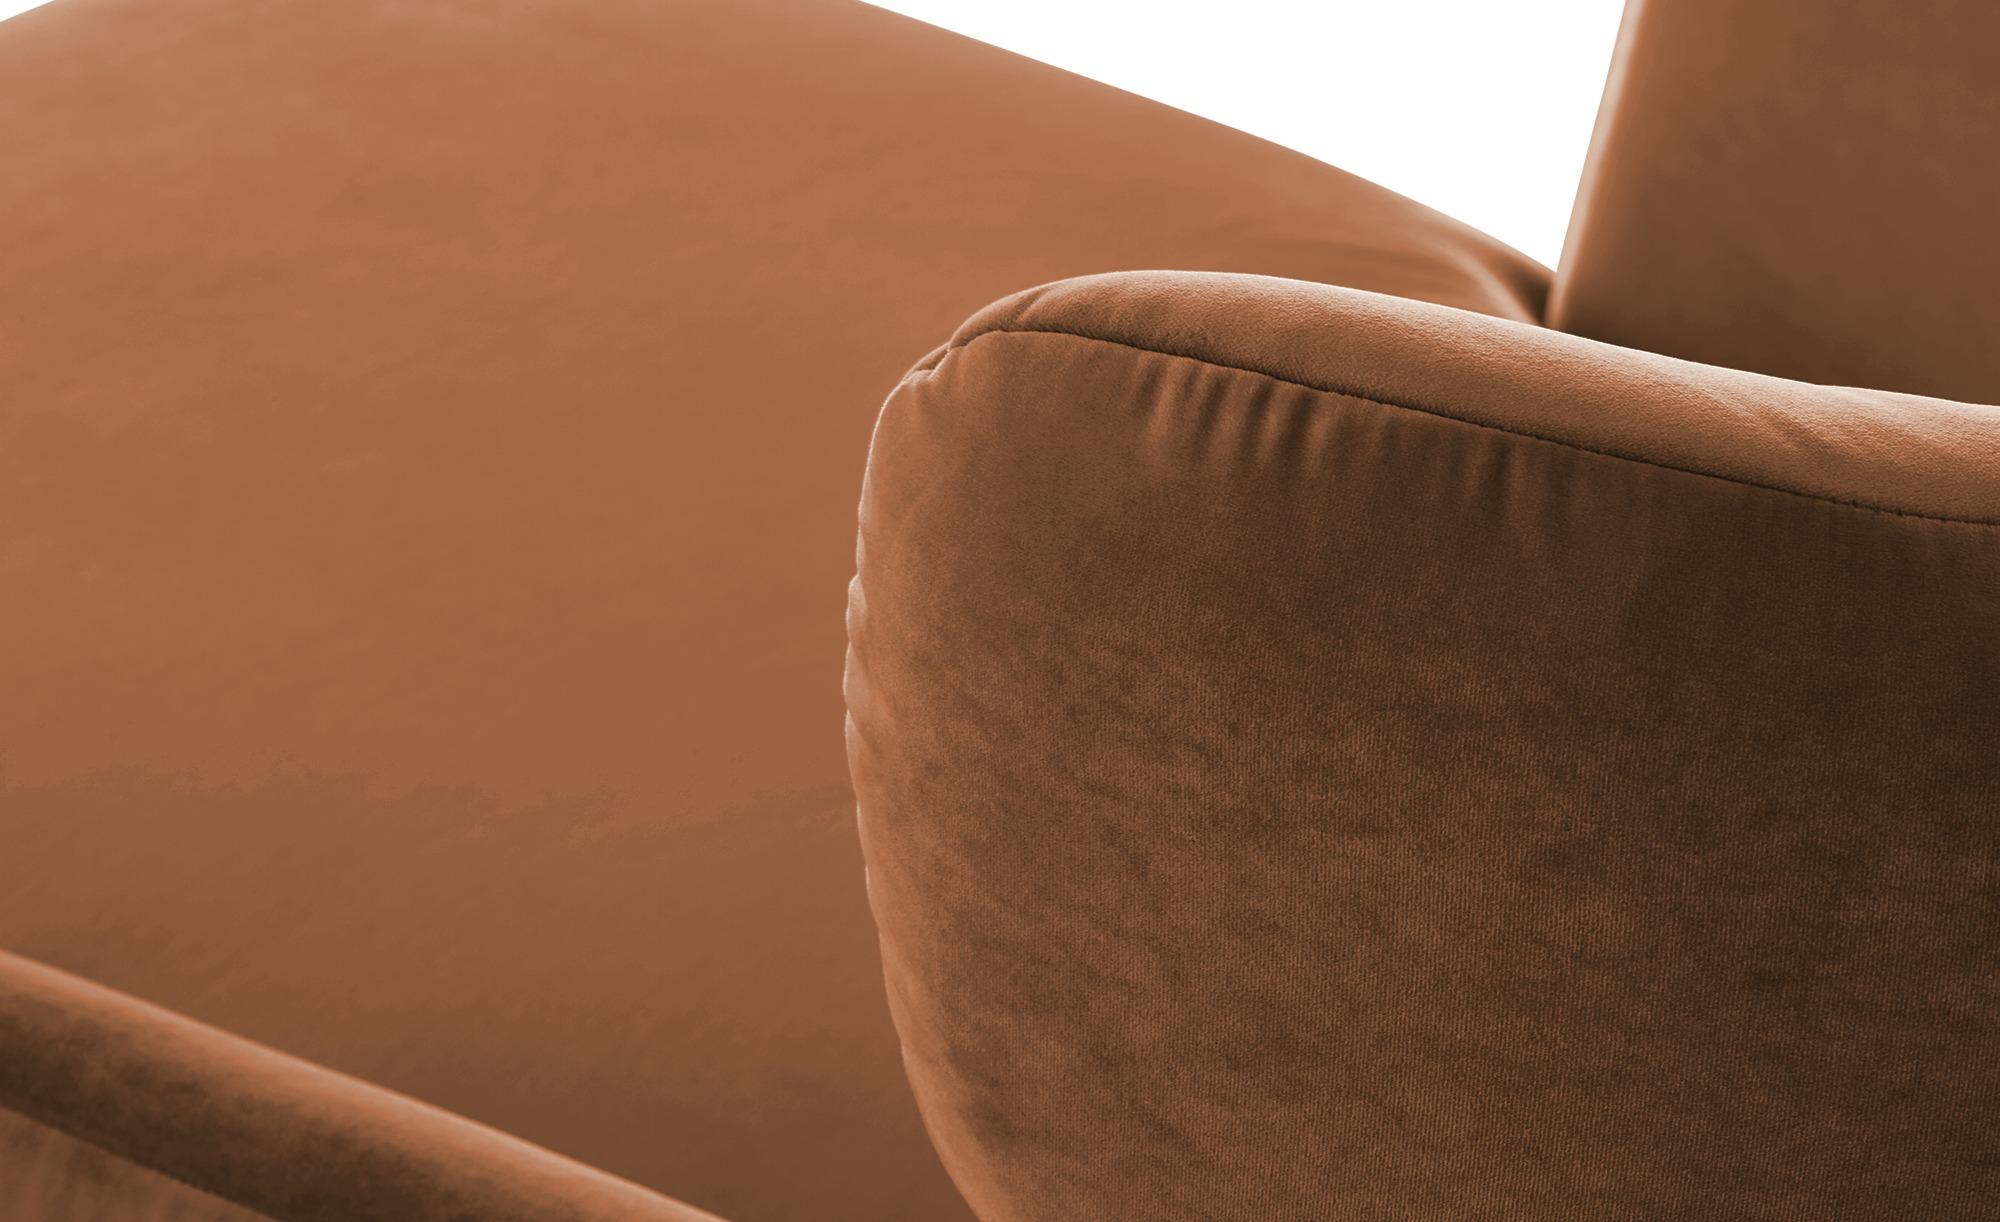 pop Longseat-Sessel  Caldara ¦ braun ¦ Maße (cm): B: 126 H: 94 T: 160 Polstermöbel > Sessel > Ohrensessel - Höffner